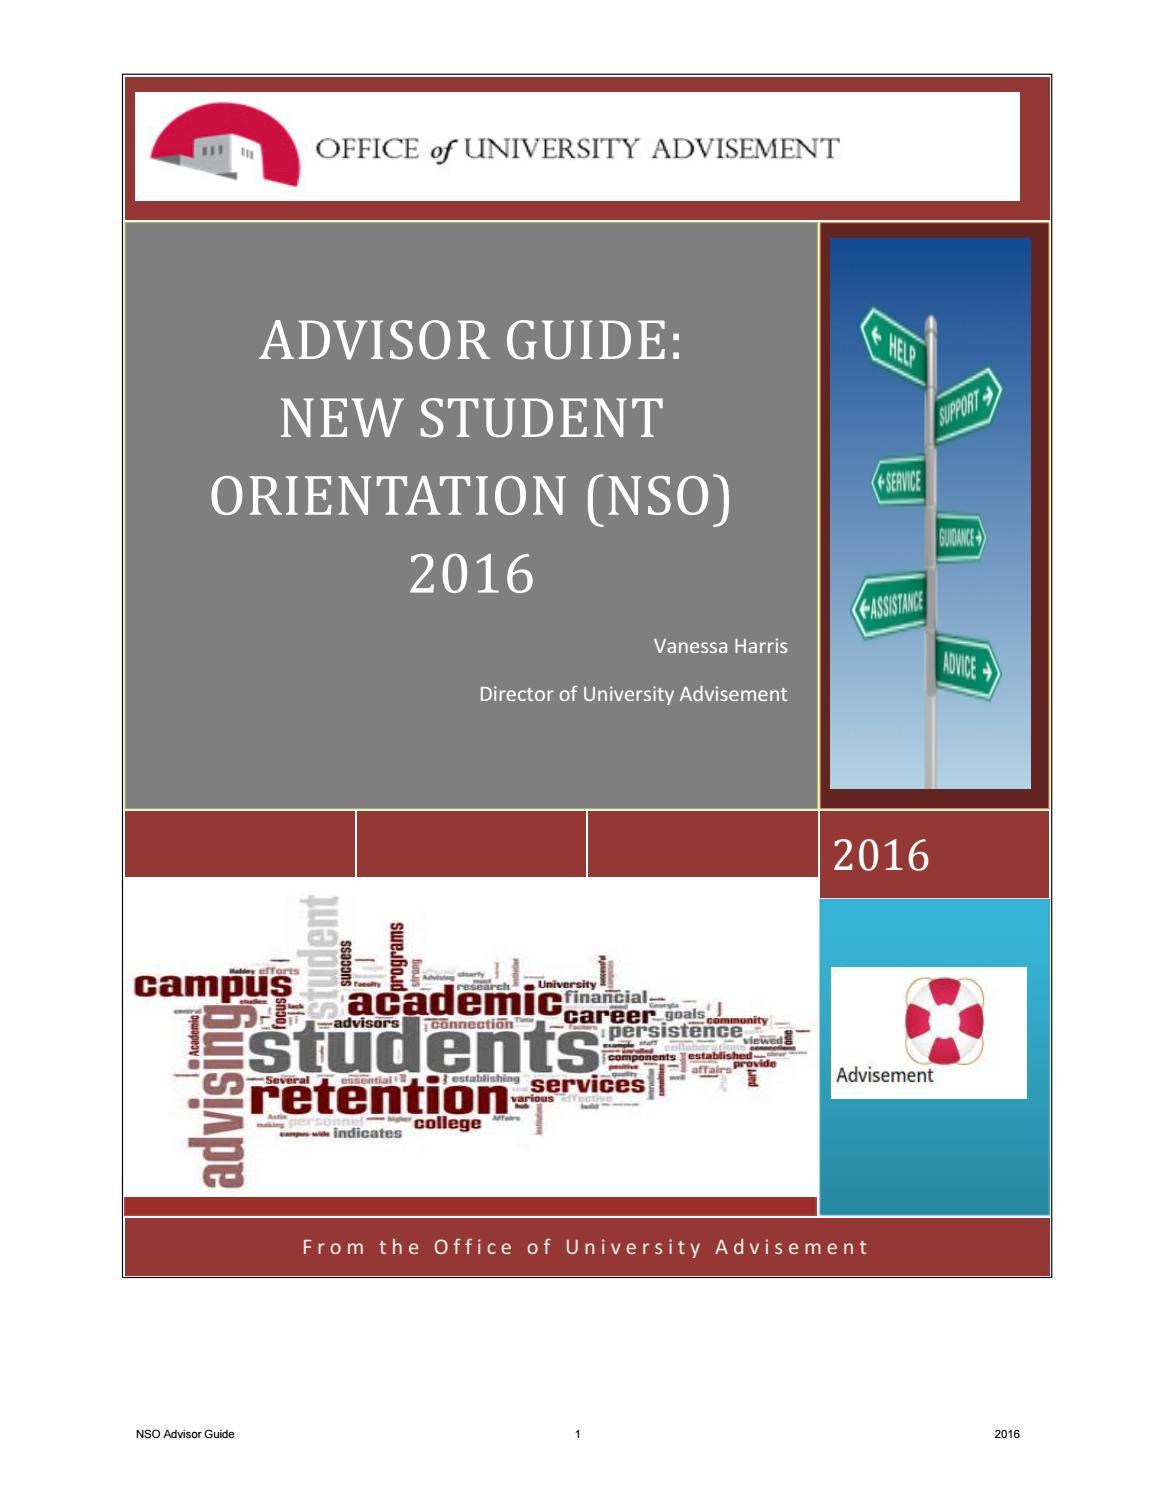 2016 UNM Advisor New Student Guide by Vanessa Major Harris